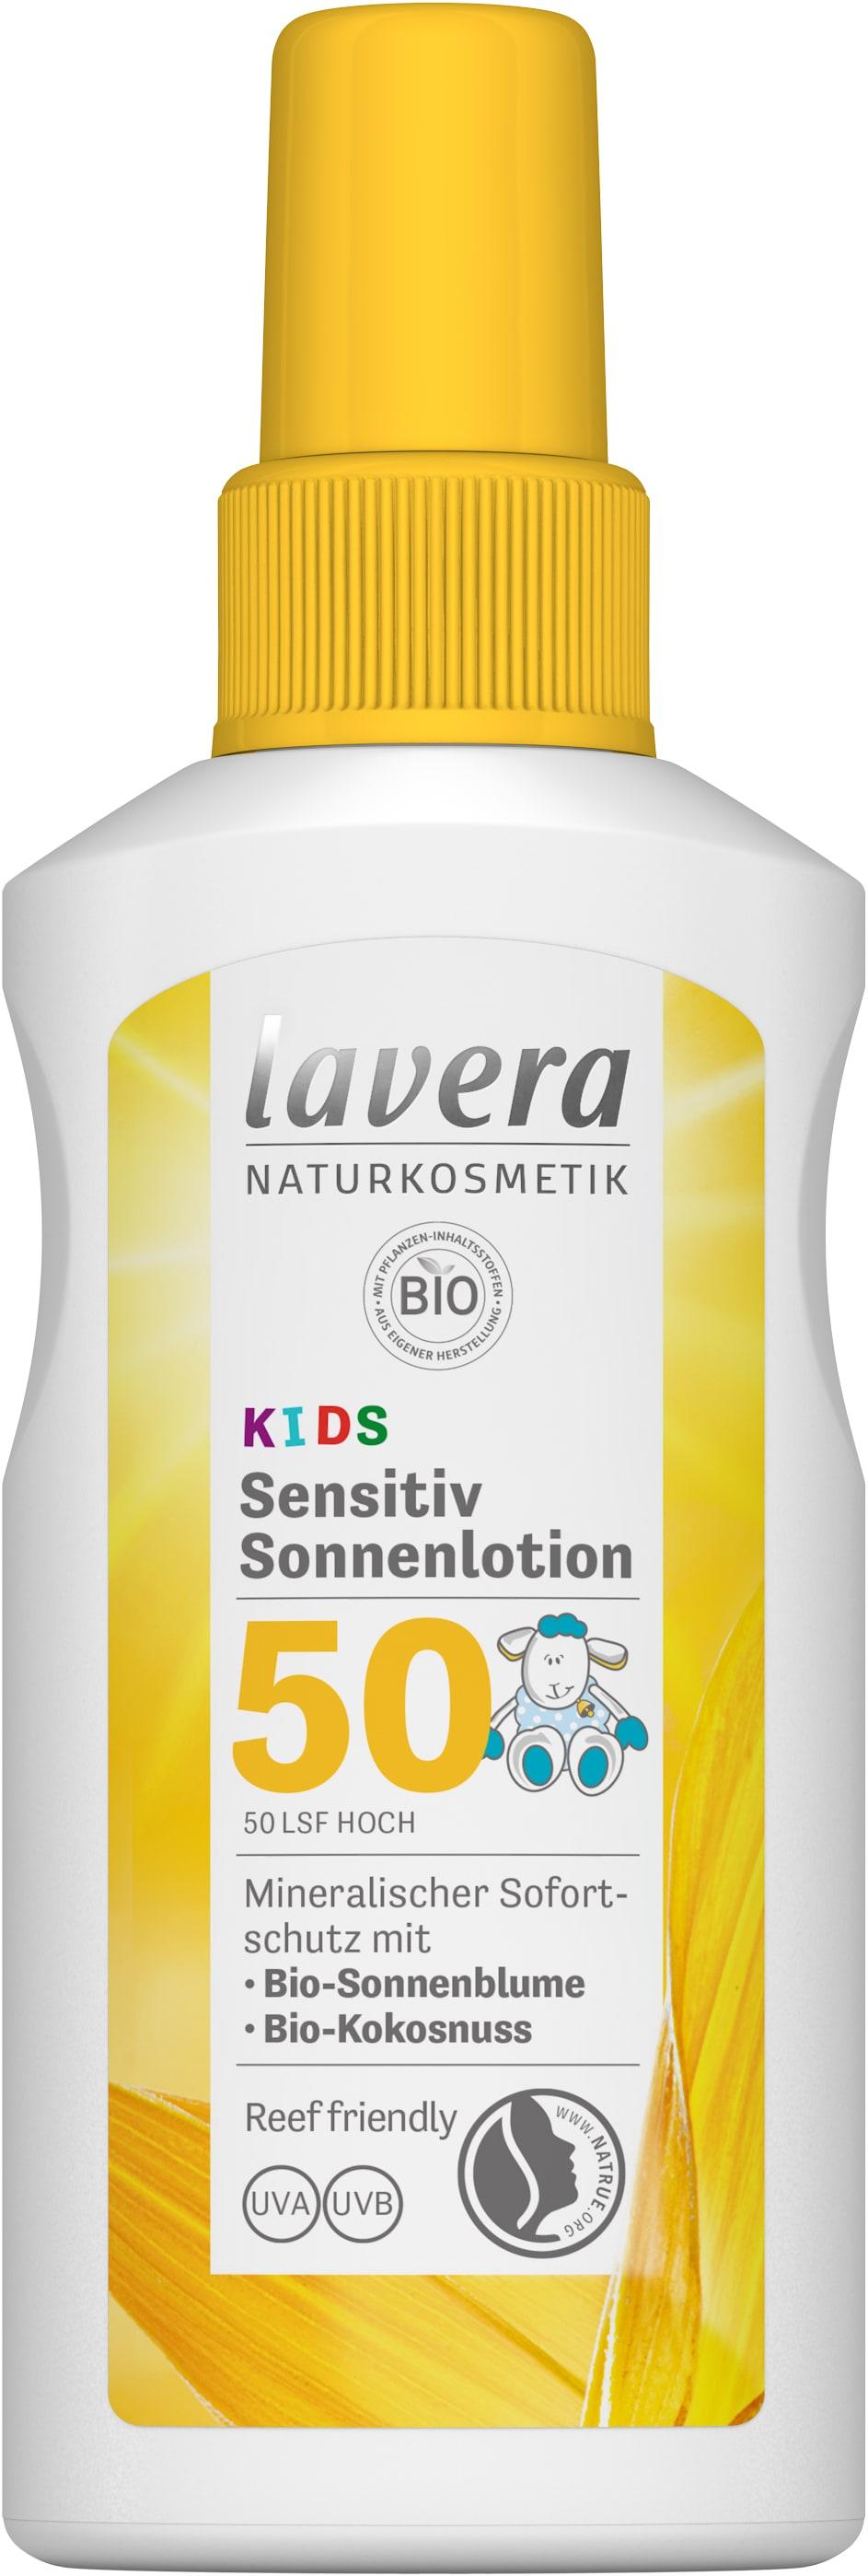 Sensitiv Sonnenlotion KIDS LSF 50